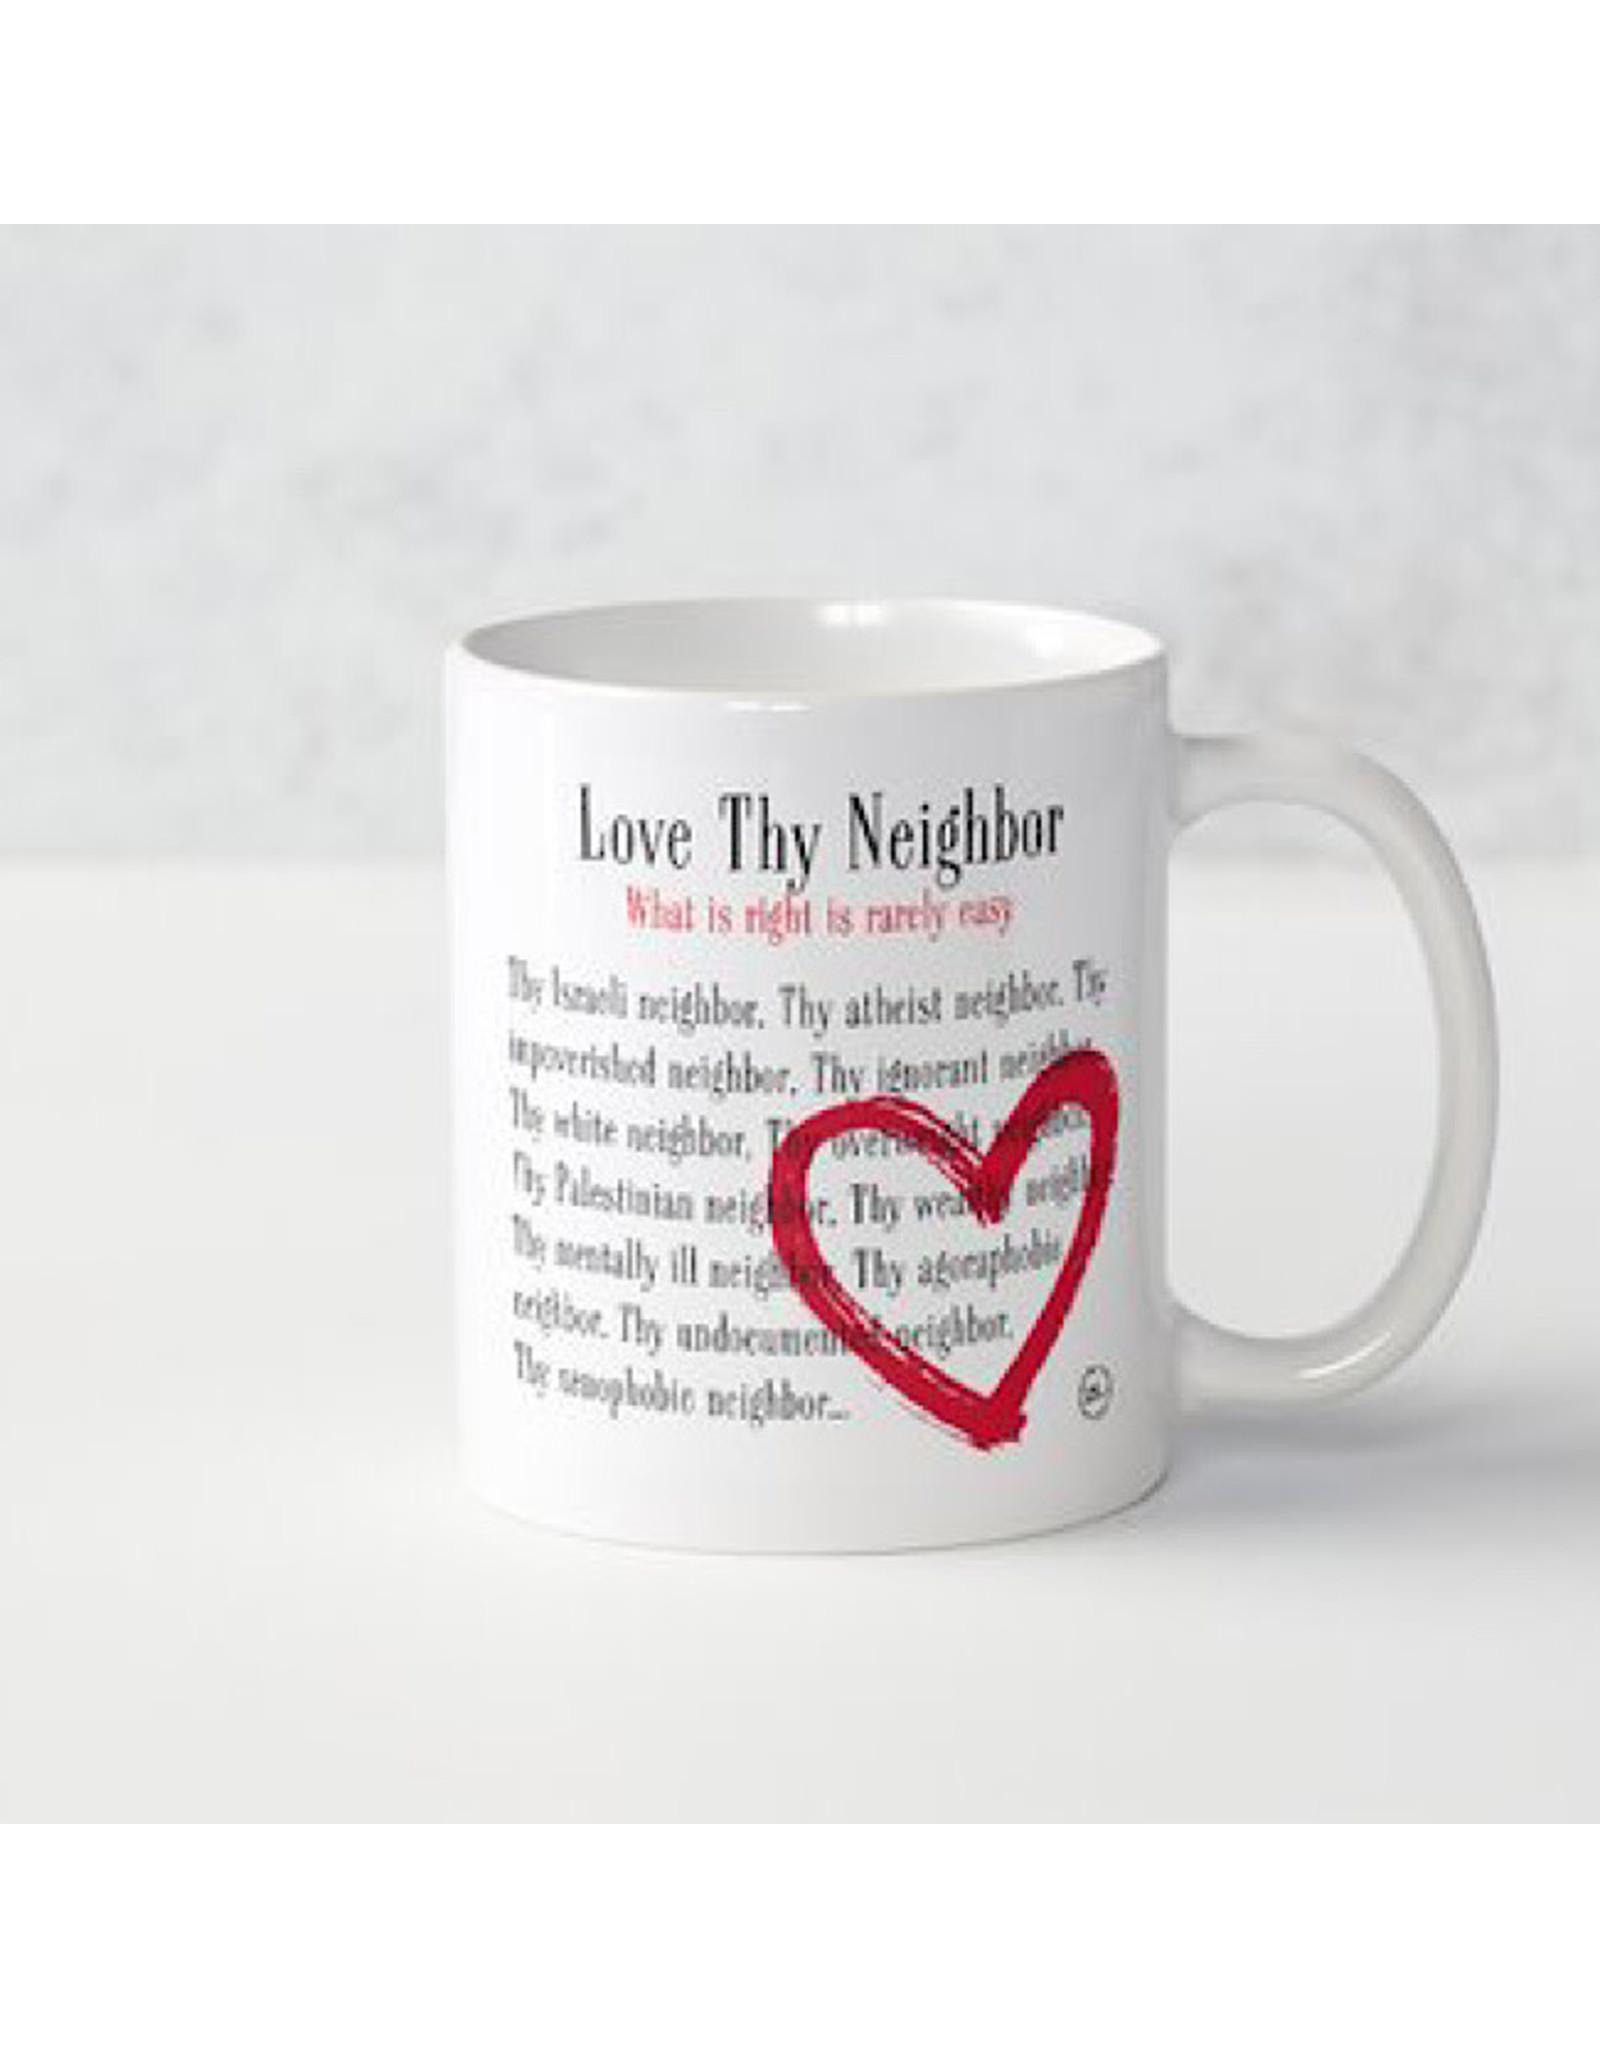 Mug - Love Thy Neighbor